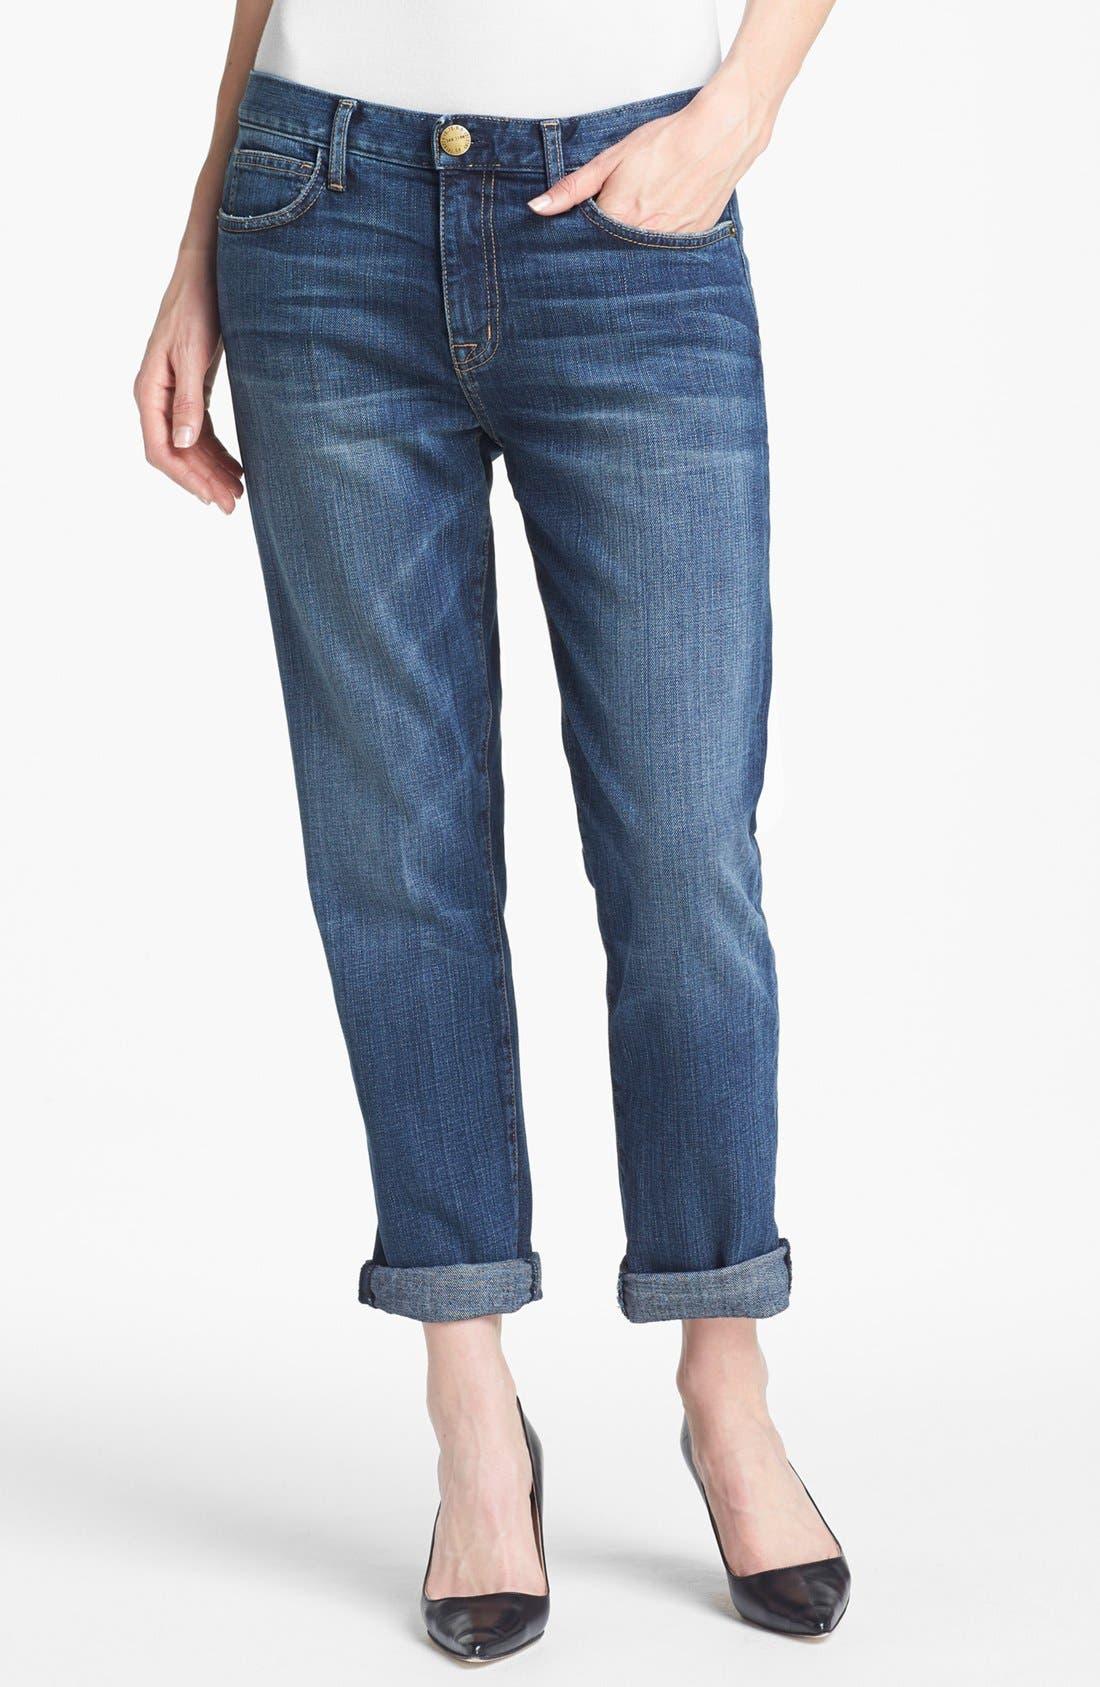 Main Image - Current/Elliott 'The Fling' Rolled Jeans (Loved)